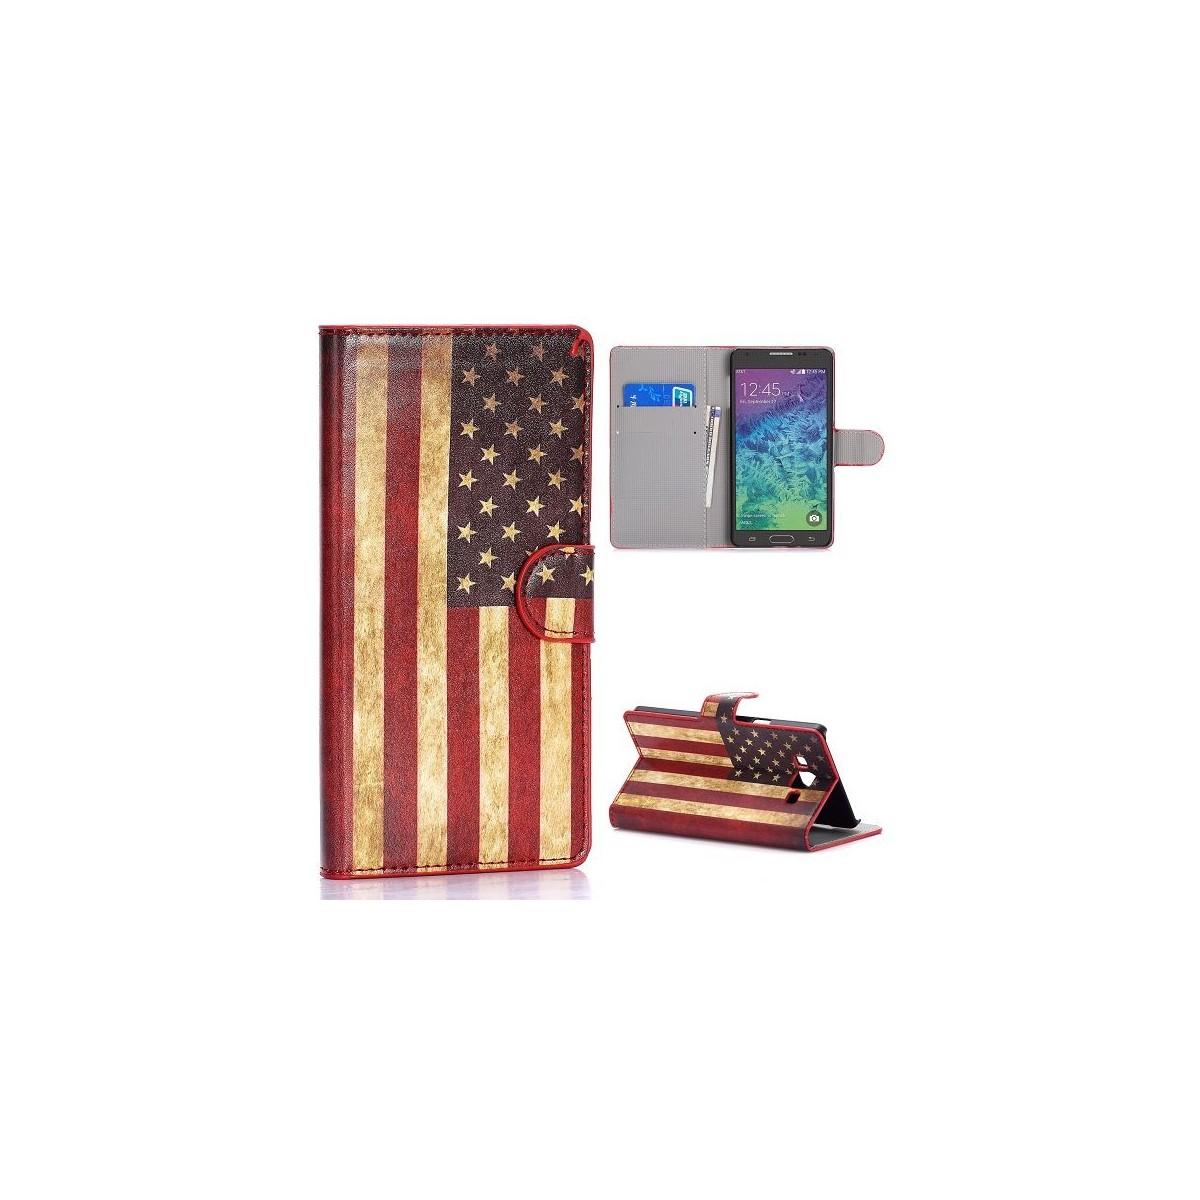 Crazy Kase - Etui Galaxy A7 Motif Drapeau USA Vintage